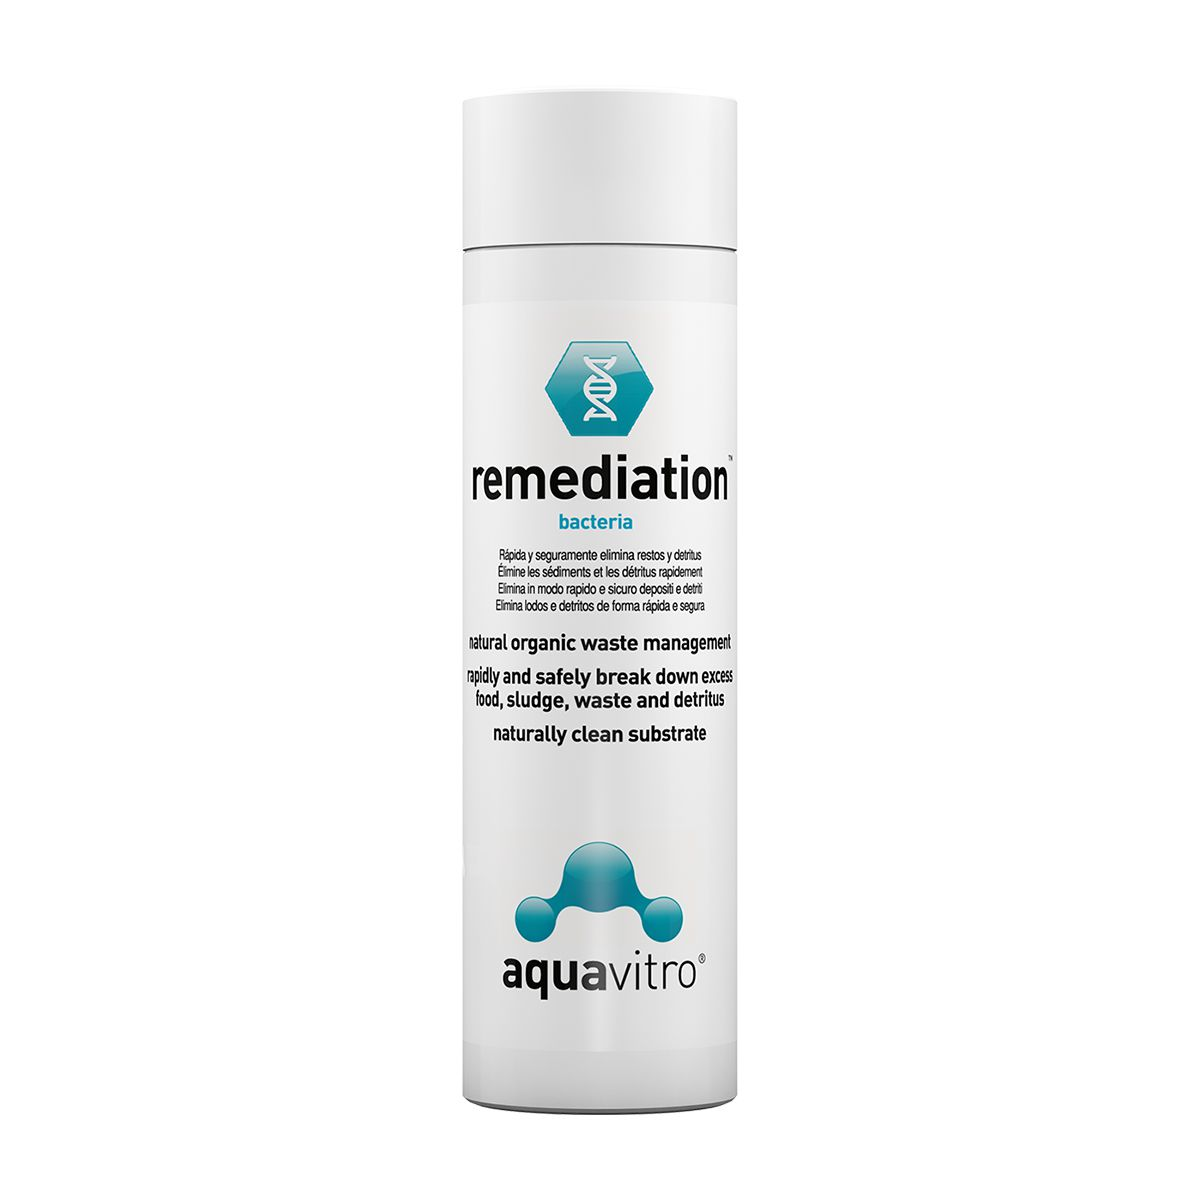 Aquavitro Seachem Remediation - Remove Matéria Organica